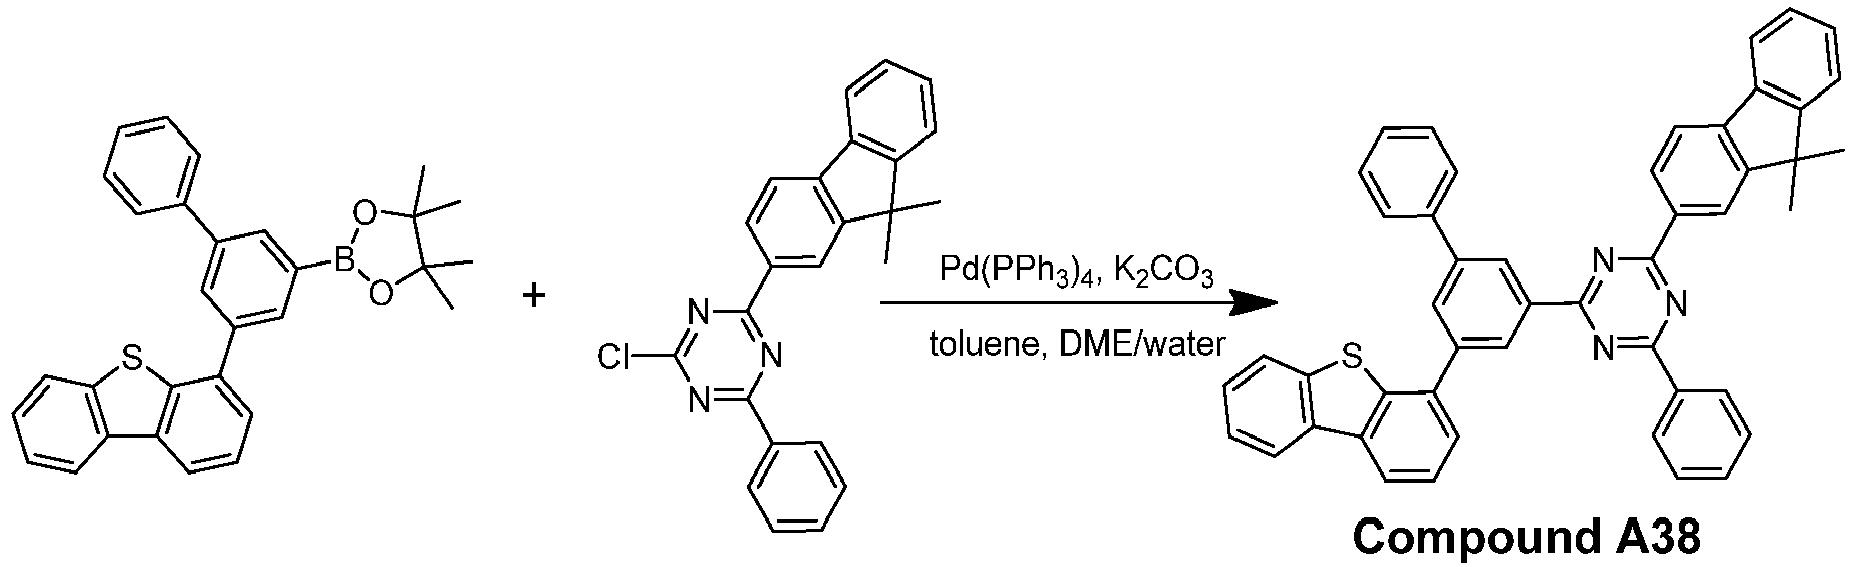 Figure imgb0347